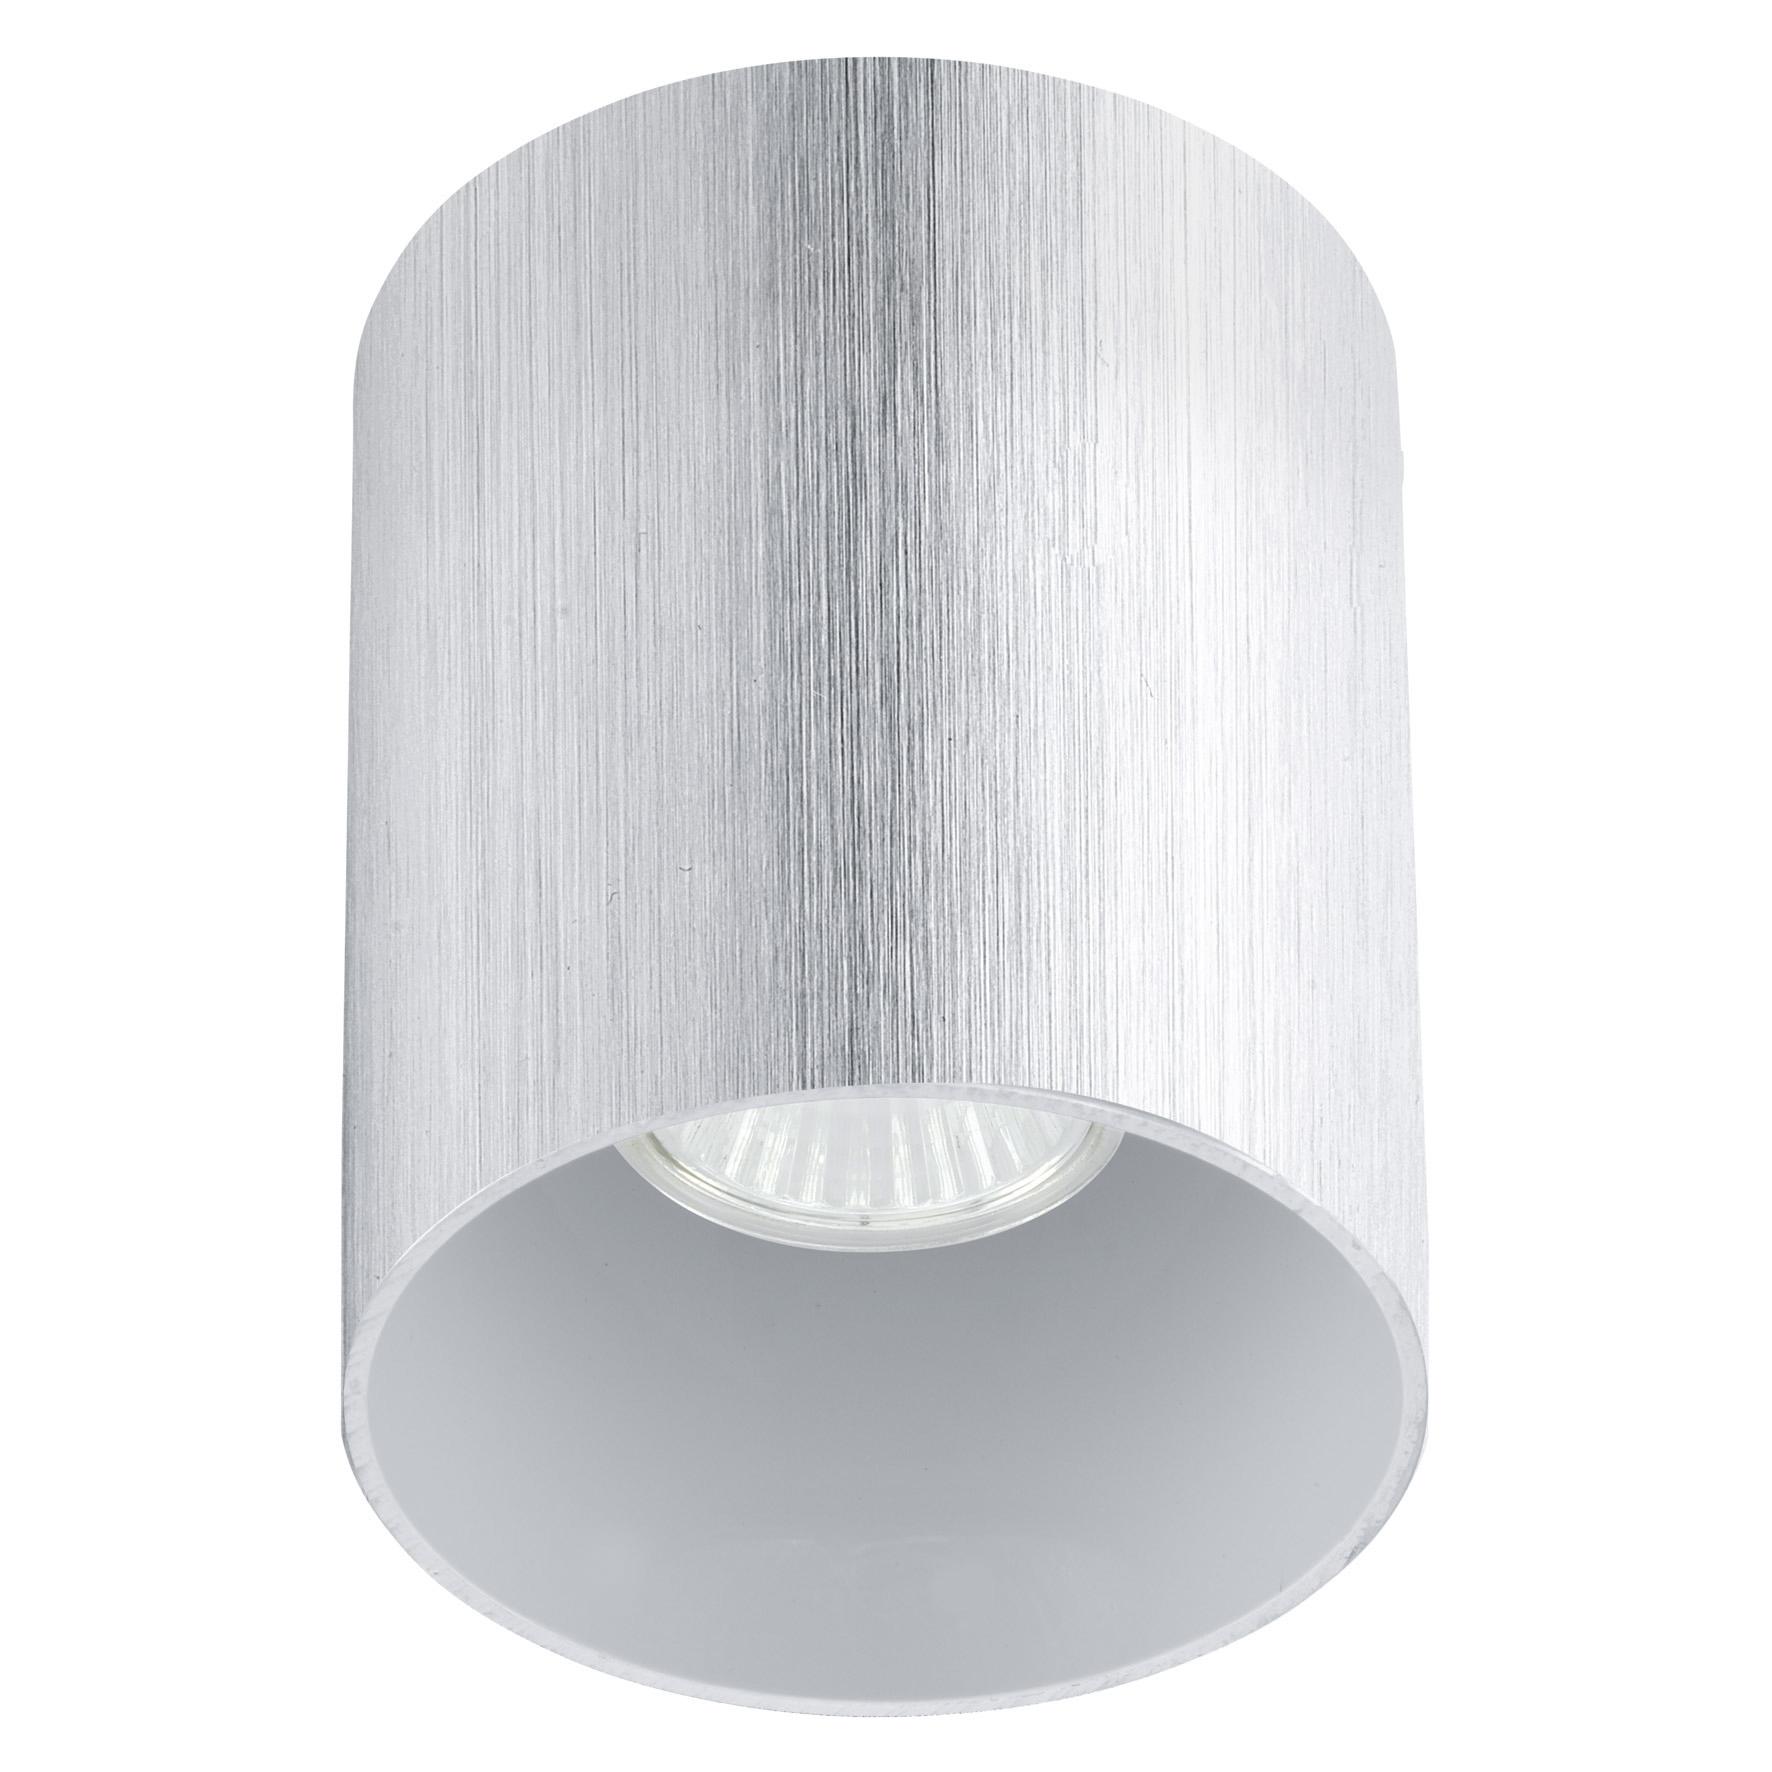 eglo-downlight-bantry-metallisch-aluminium-91196